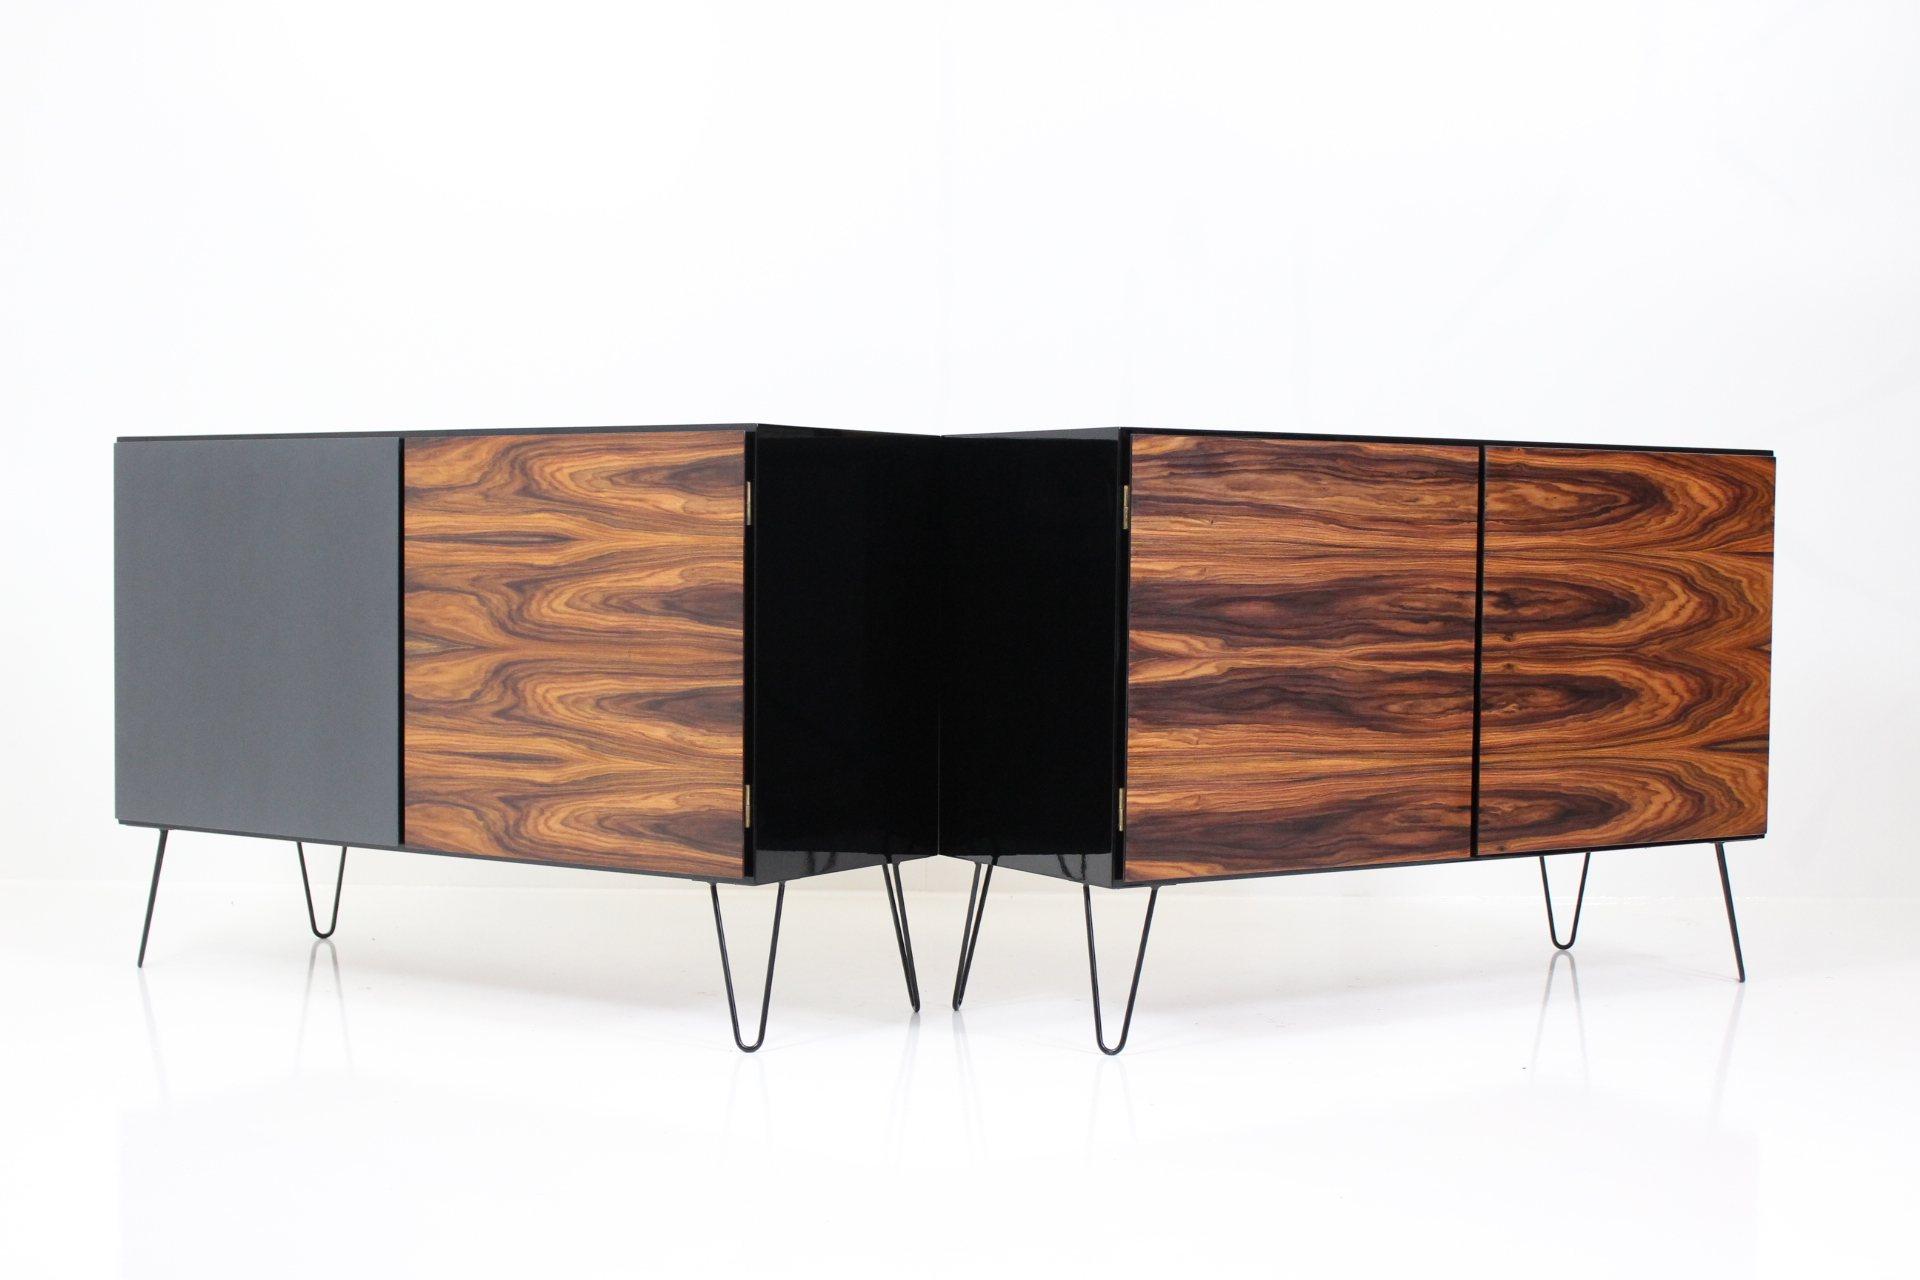 Vintage Black Gold Series Sideboards no. 4 by Gunni Oman for Omann Jun's Møbelfabrik